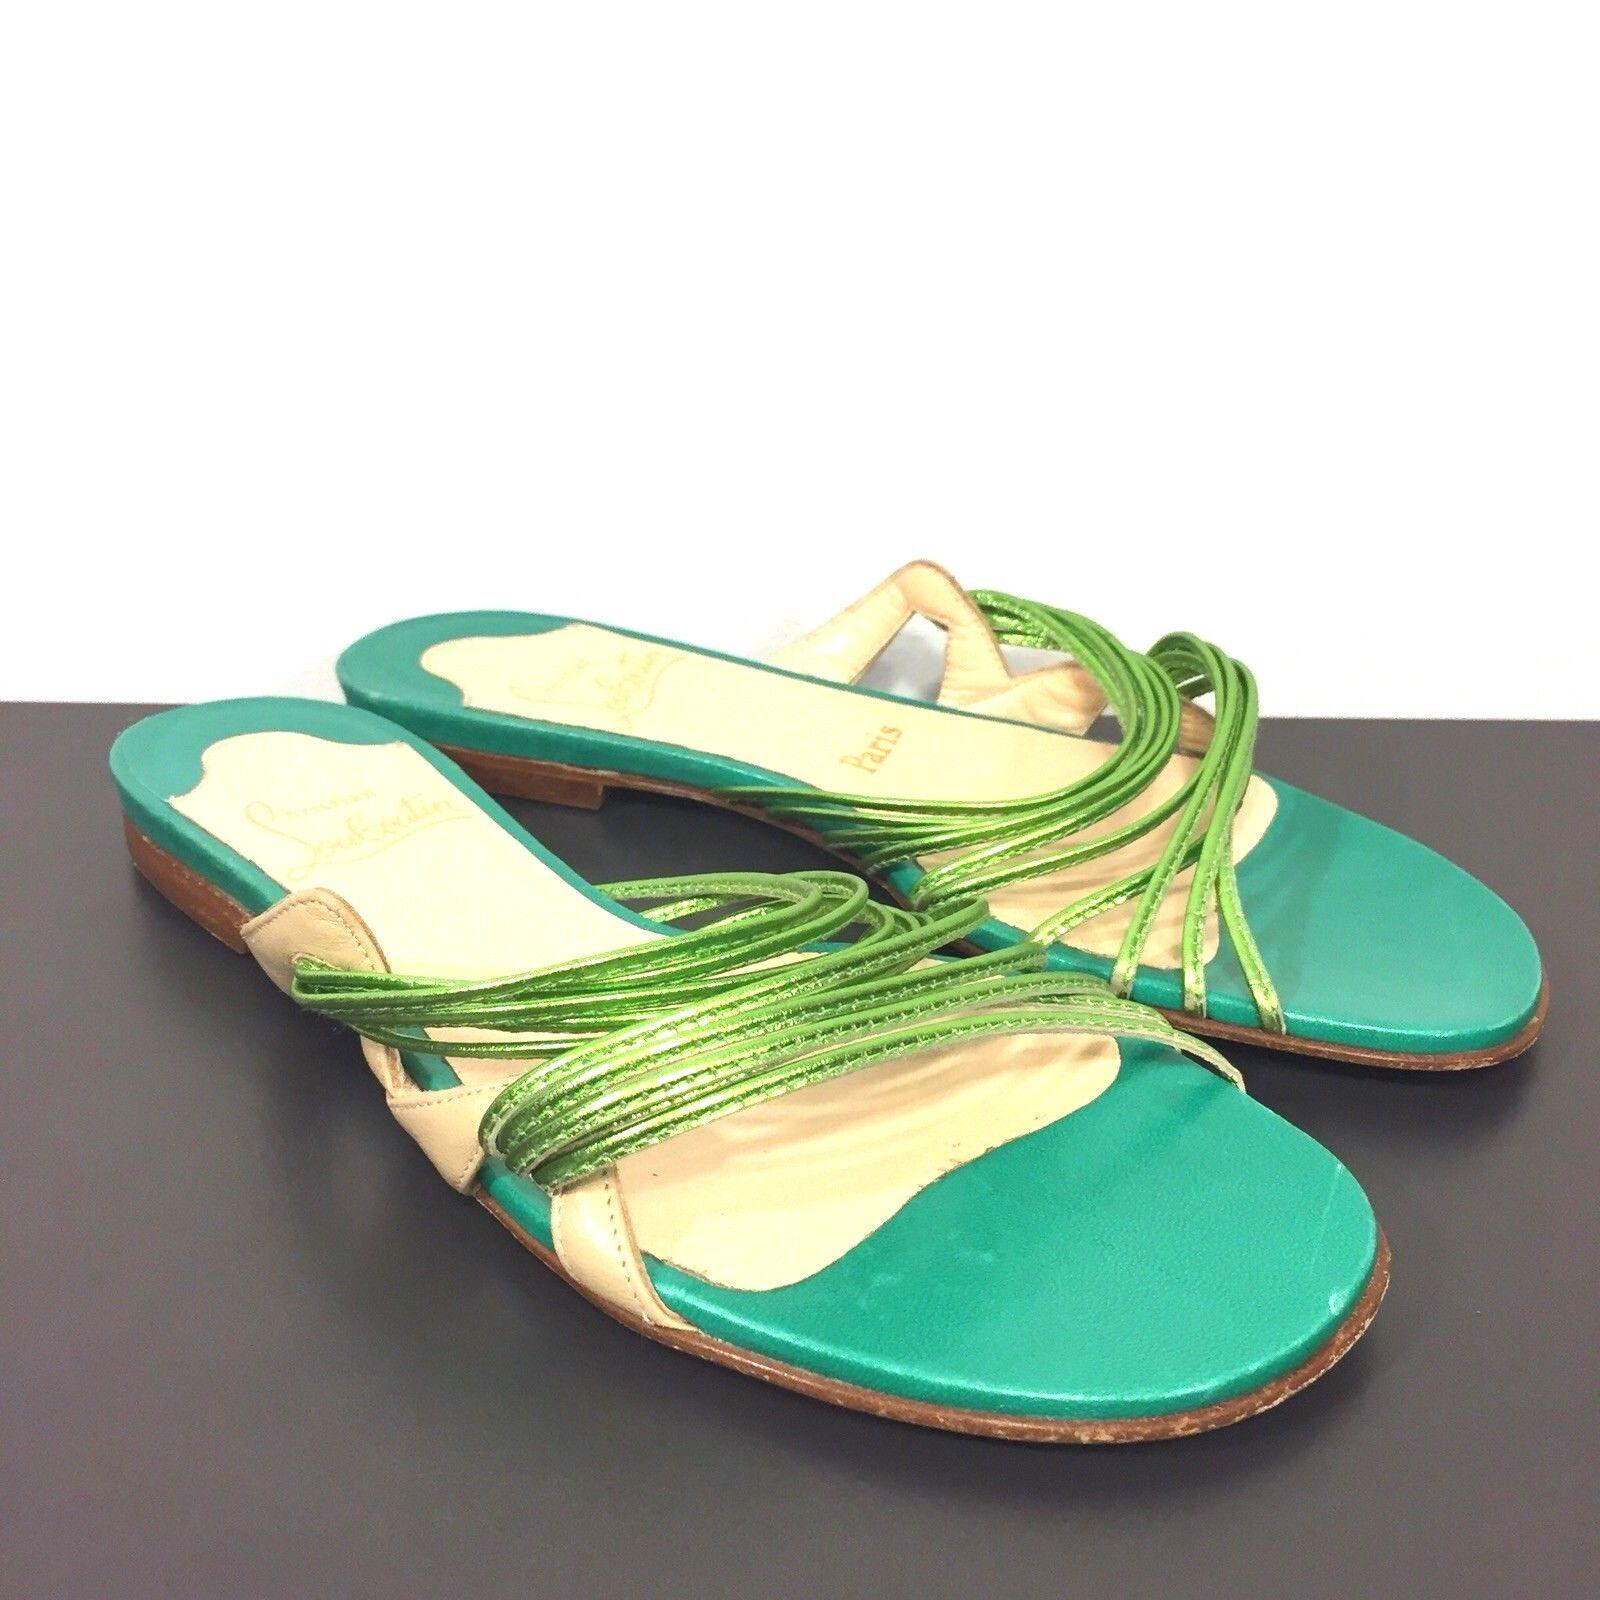 CHRISTIAN LOUBOUTIN Womens Frescobaldi Flat Slip On Sandals Green 37 (MSRP  895)